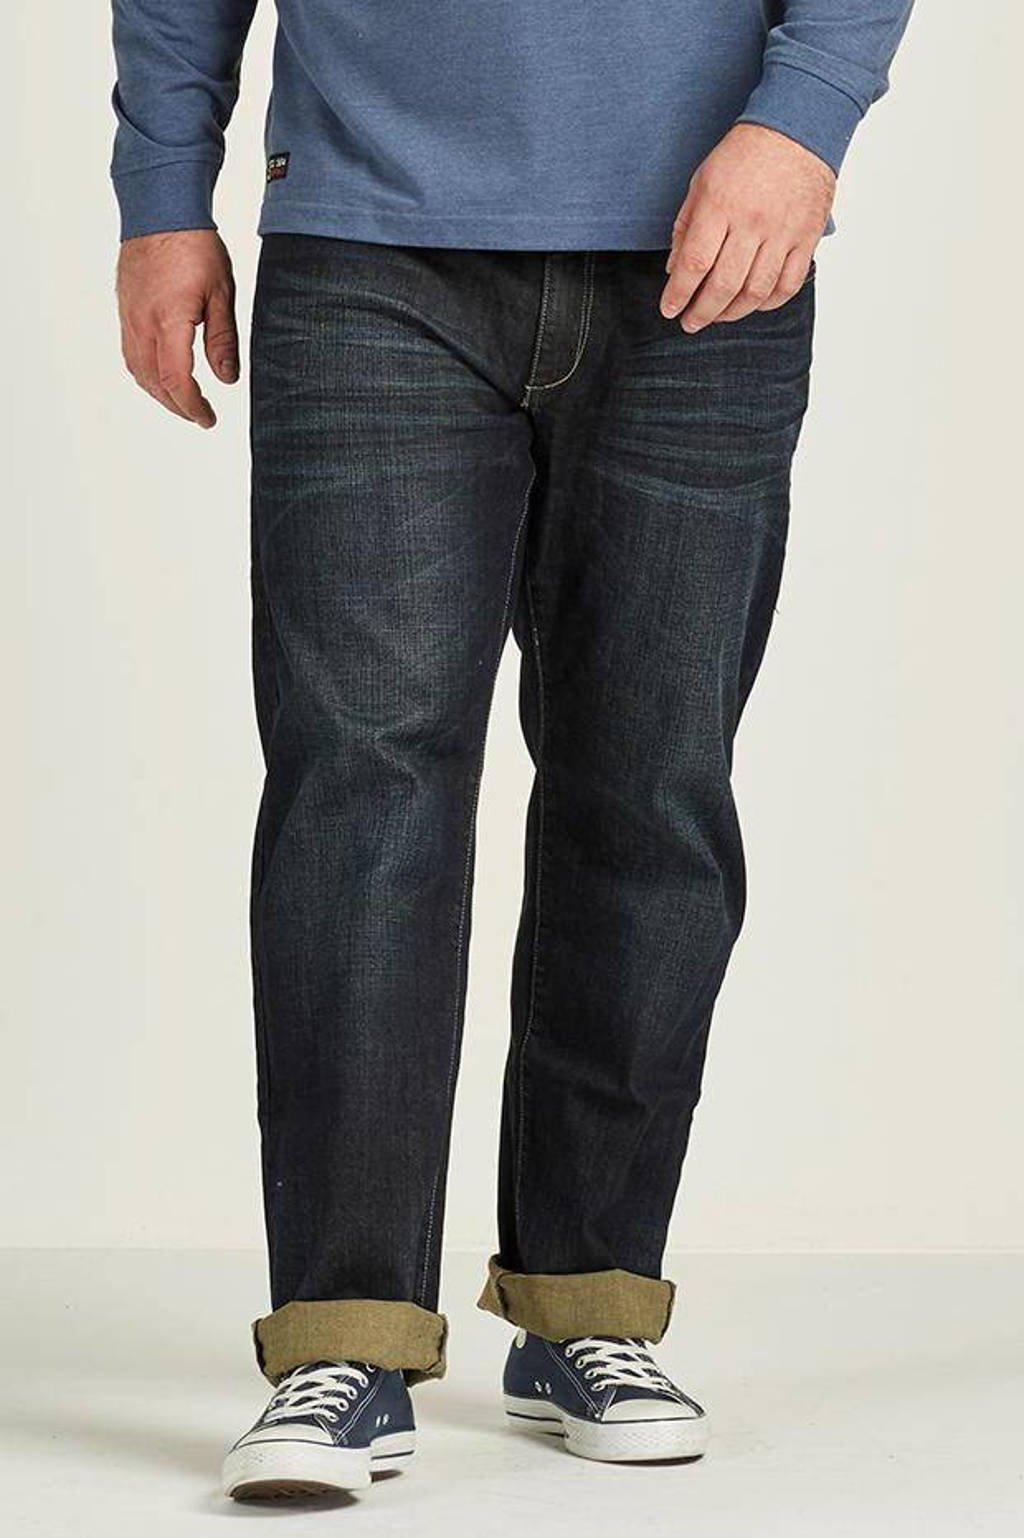 Replika +size regular fit jeans Mick, Dark blue washed